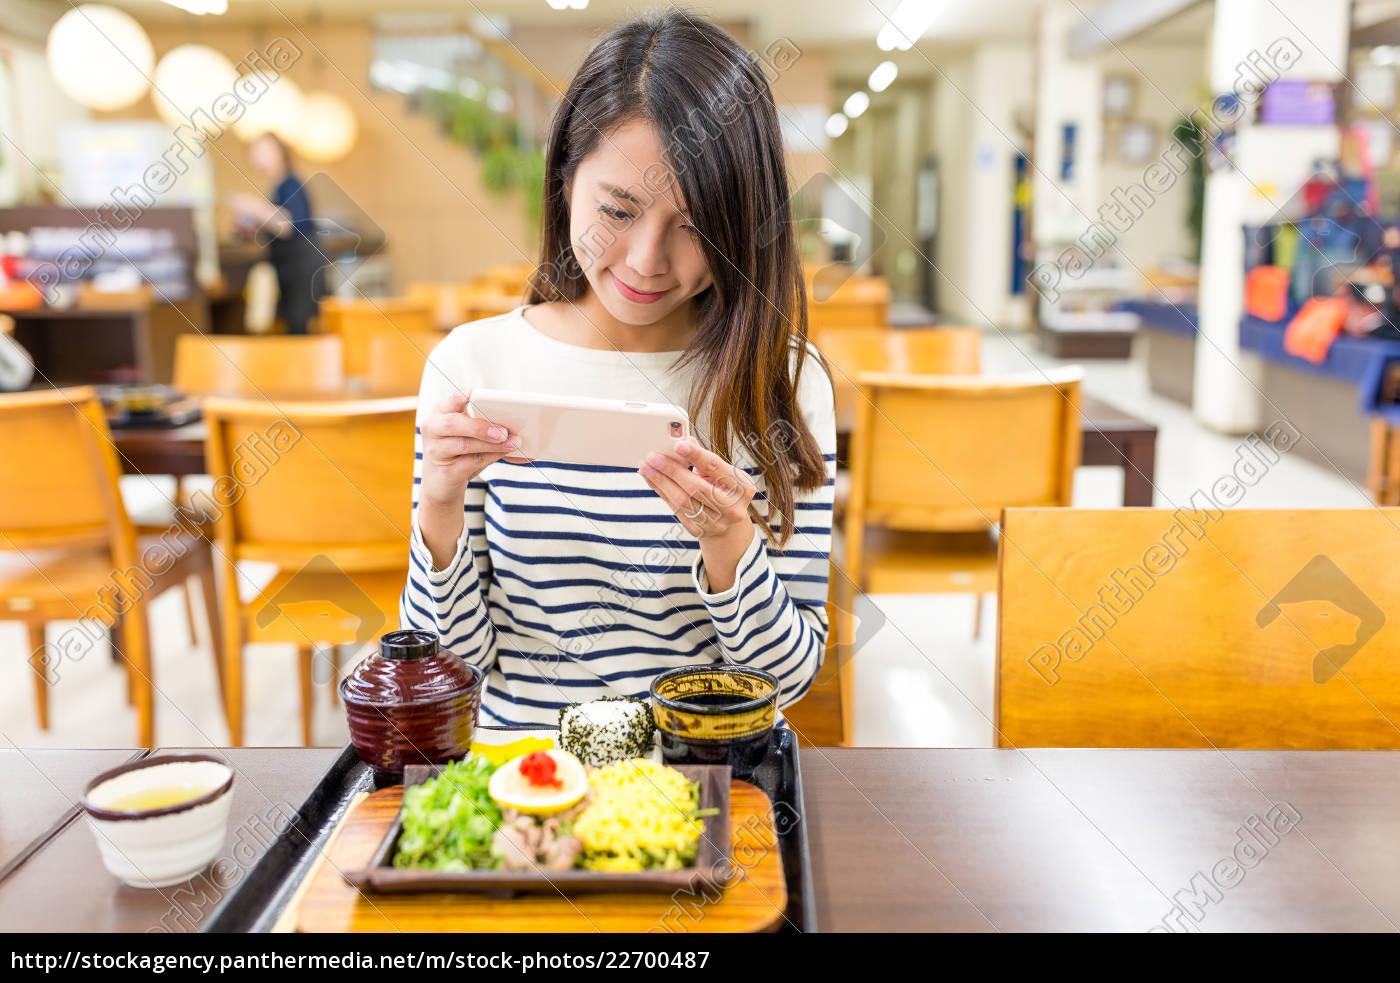 woman, taking, photo, on, japanese, cuisine - 22700487